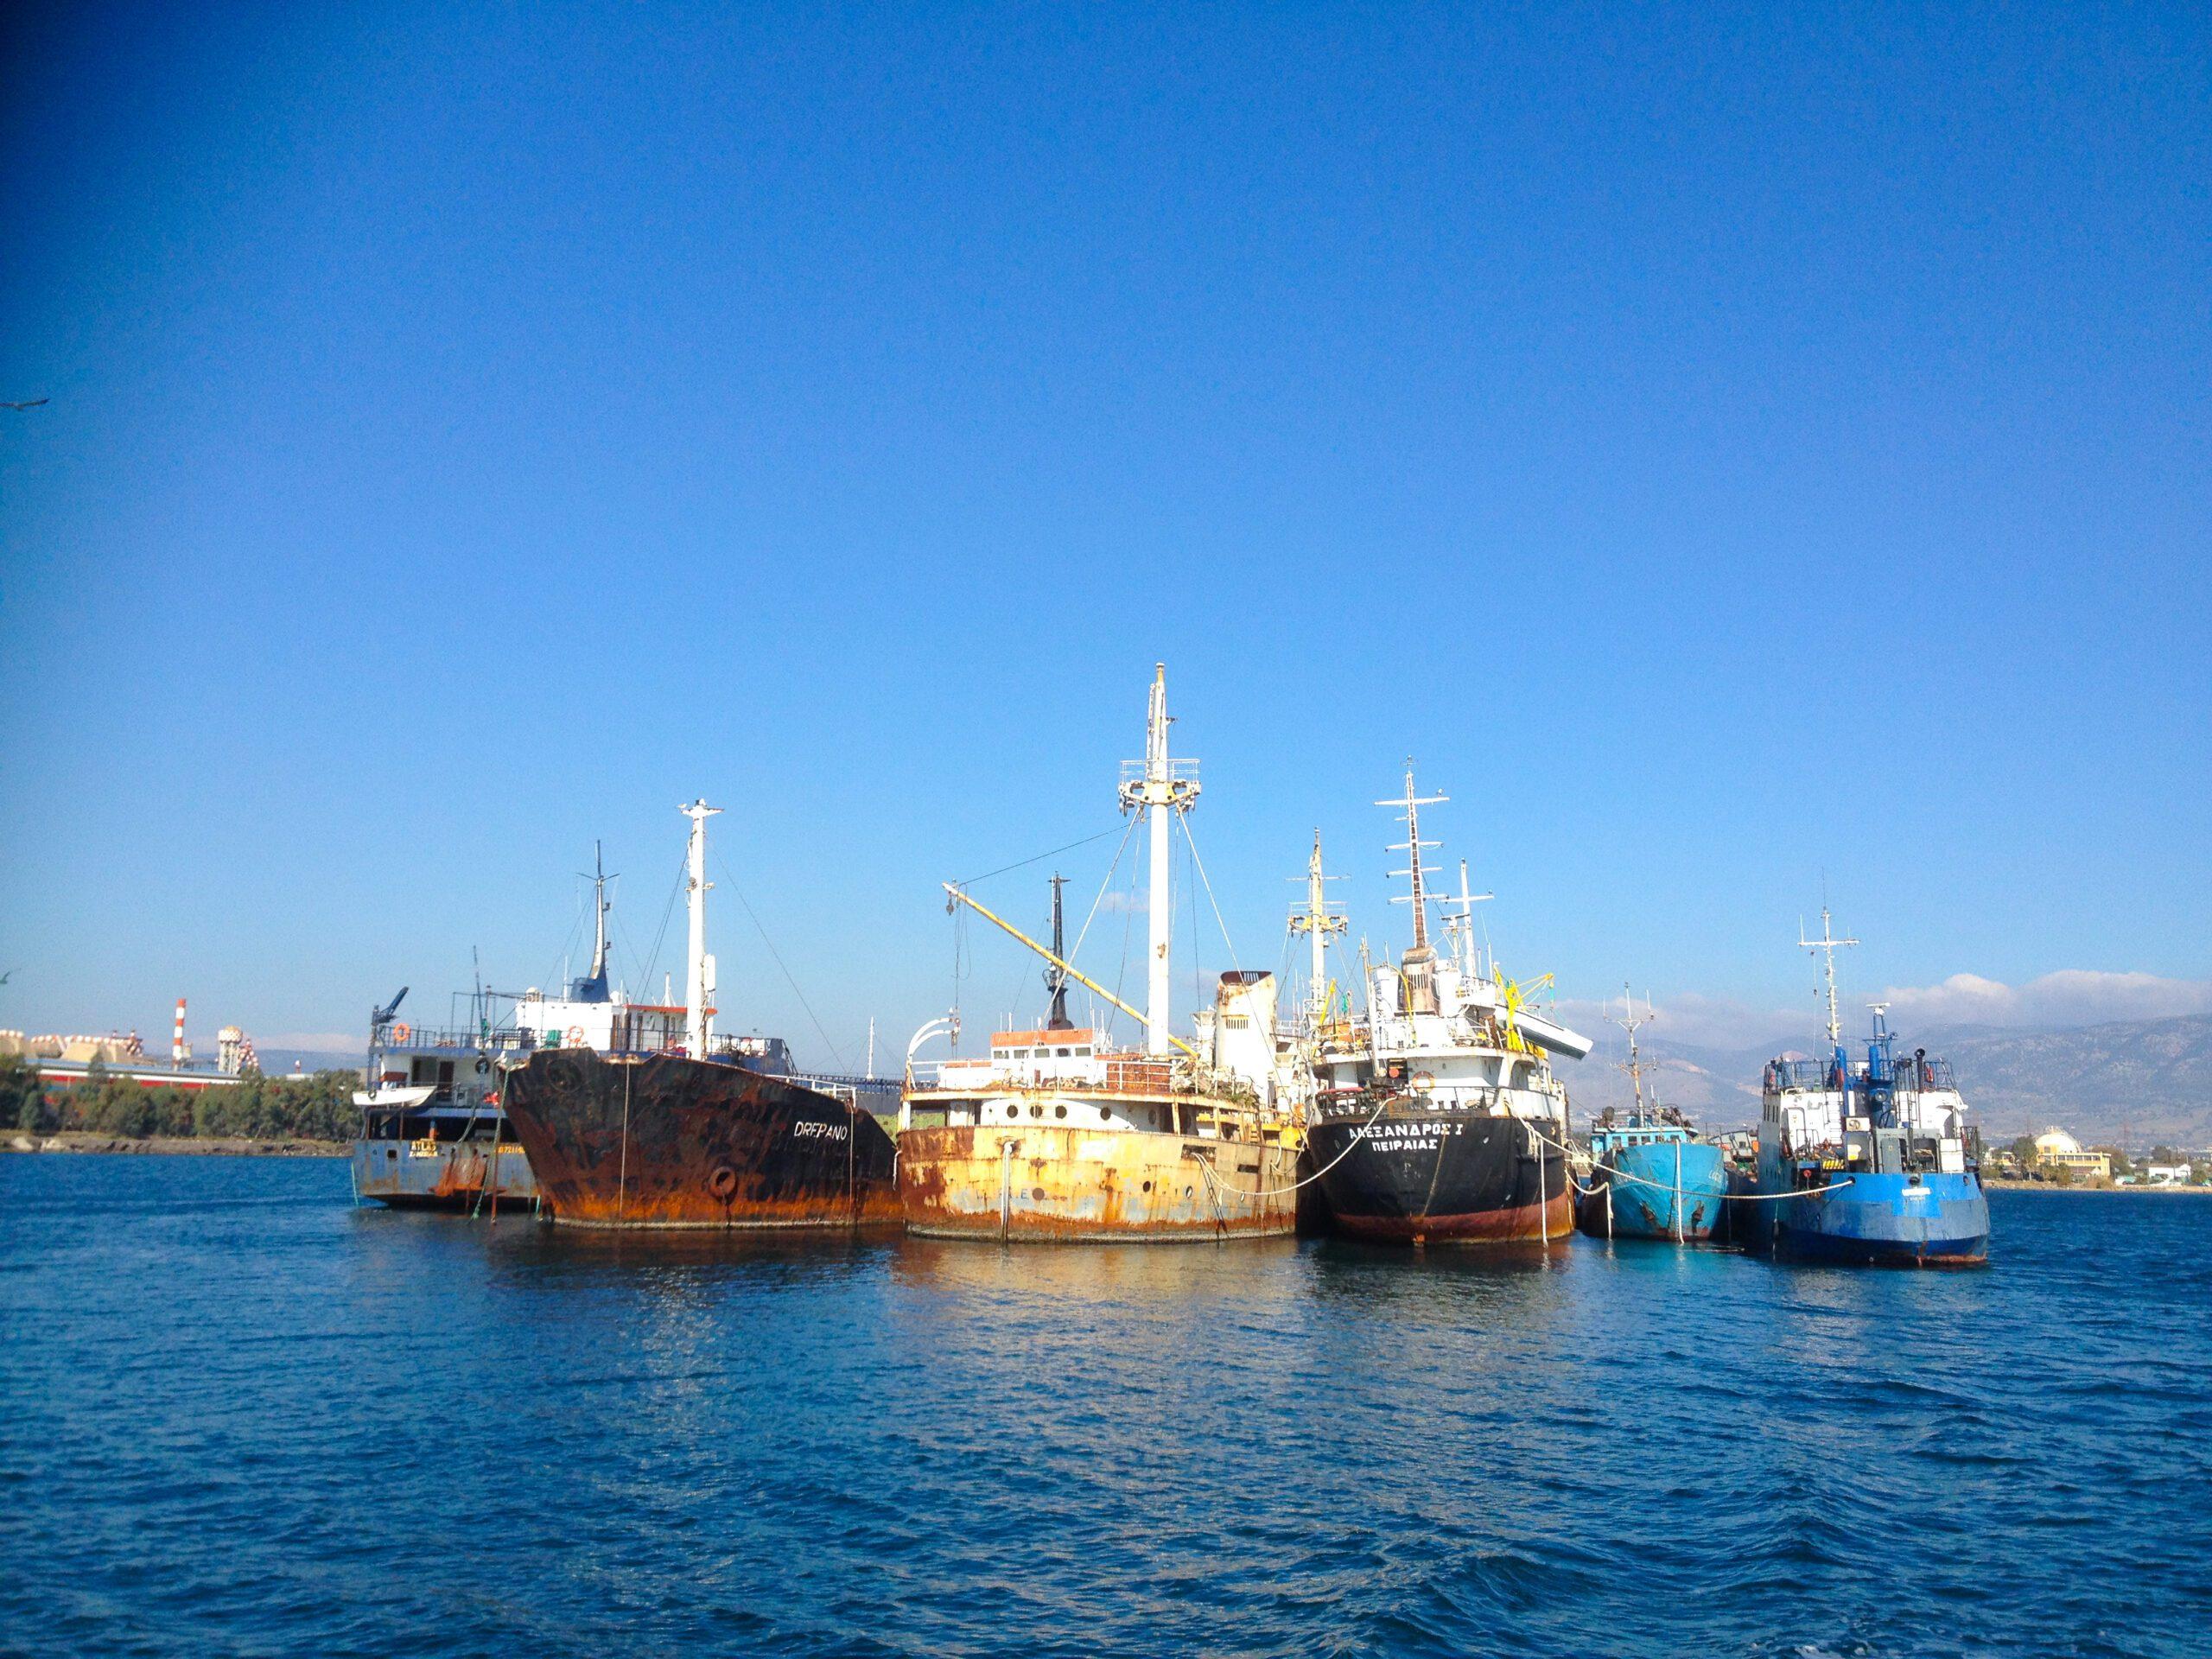 You are currently viewing Συγκρότηση Επιτροπής Τεχνικών Συμβούλων του ΟΛΕ ΑΕ για την ανέλκυση επικίνδυνων πλοίων και ναυαγίων